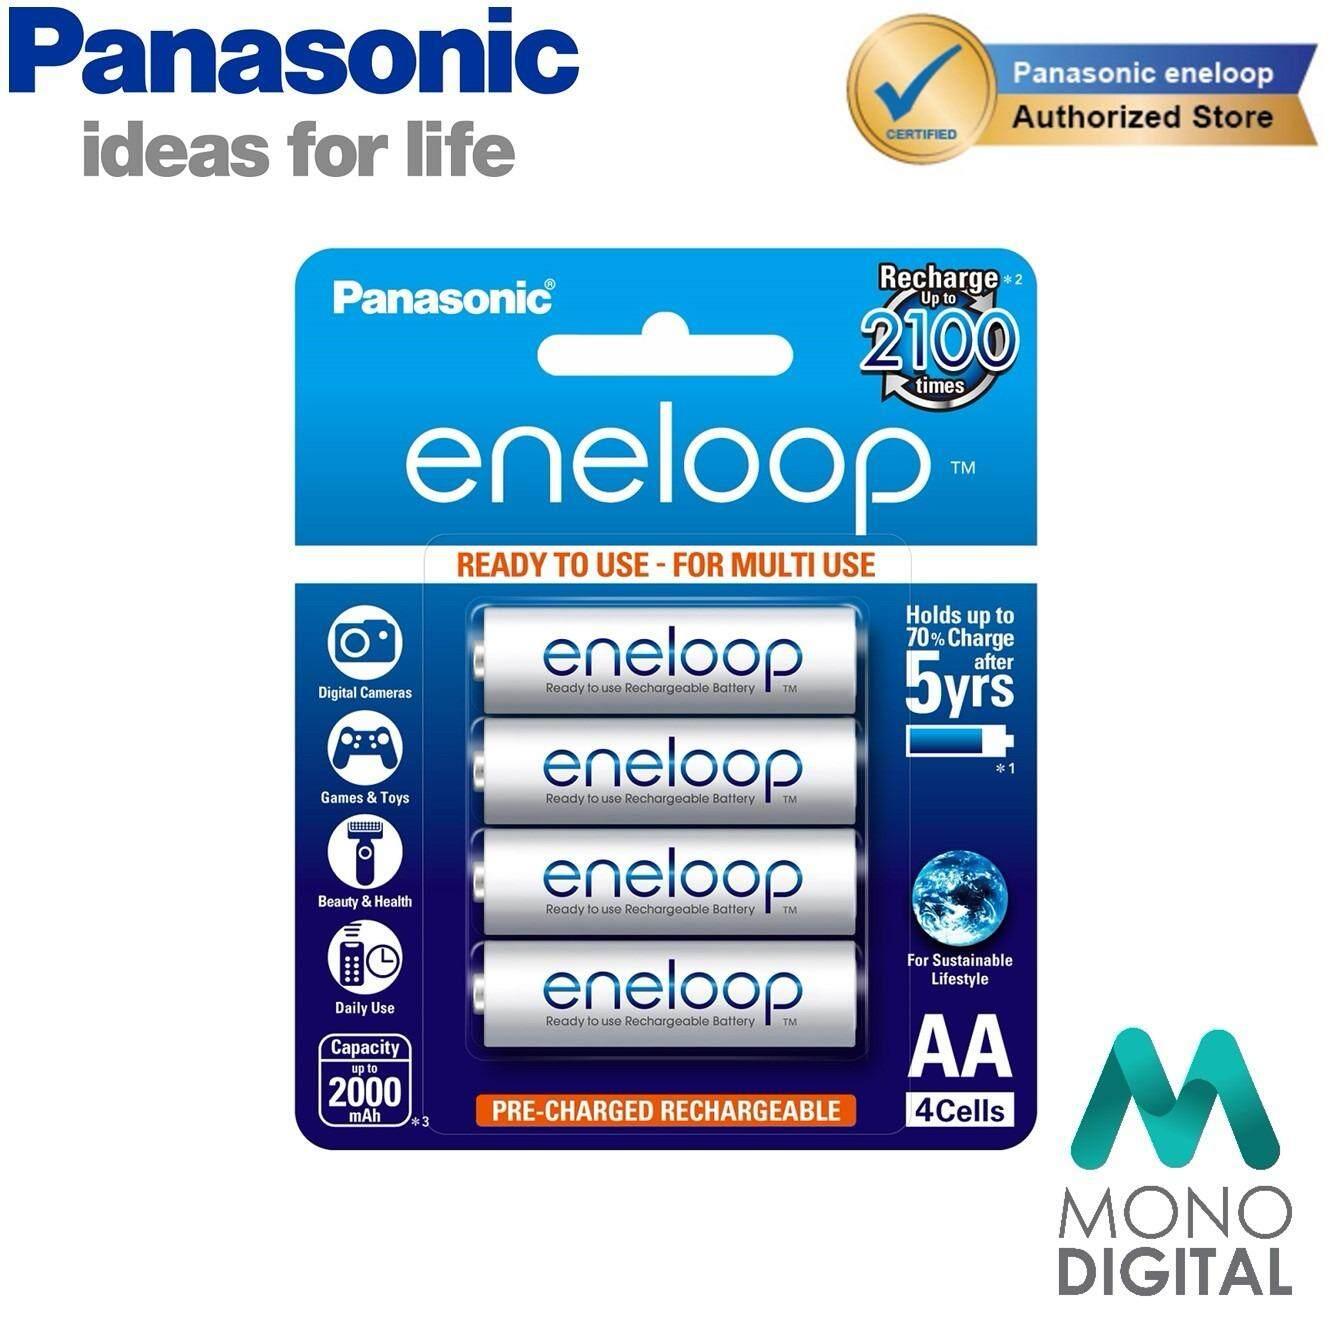 PANASONIC Eneloop AA Battery 4 x 2000mAh Rechargeable Battery (ORIGINAL) Malaysia